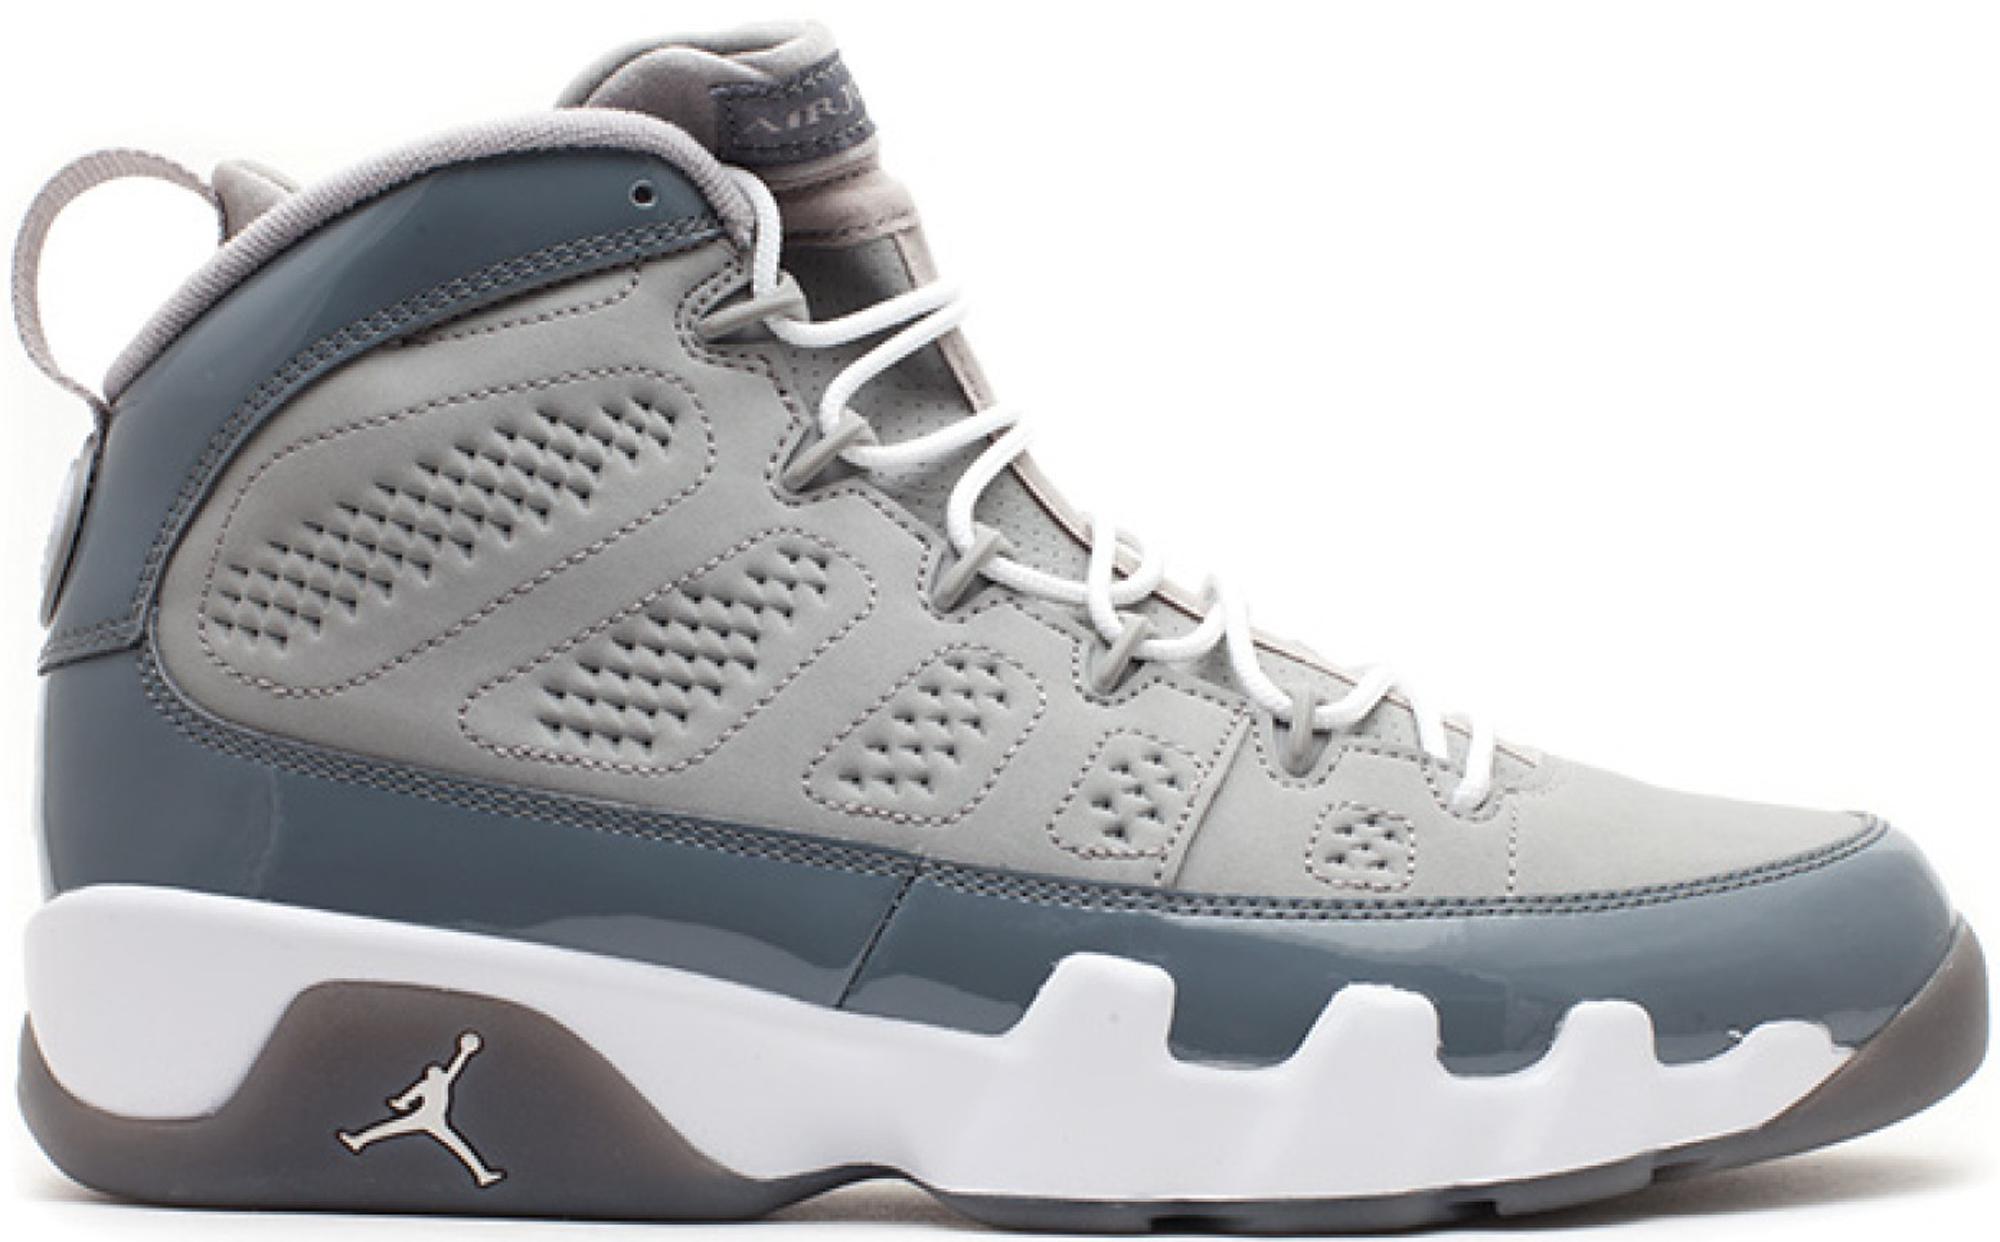 Jordan 9 Retro Cool Grey 2012 (GS